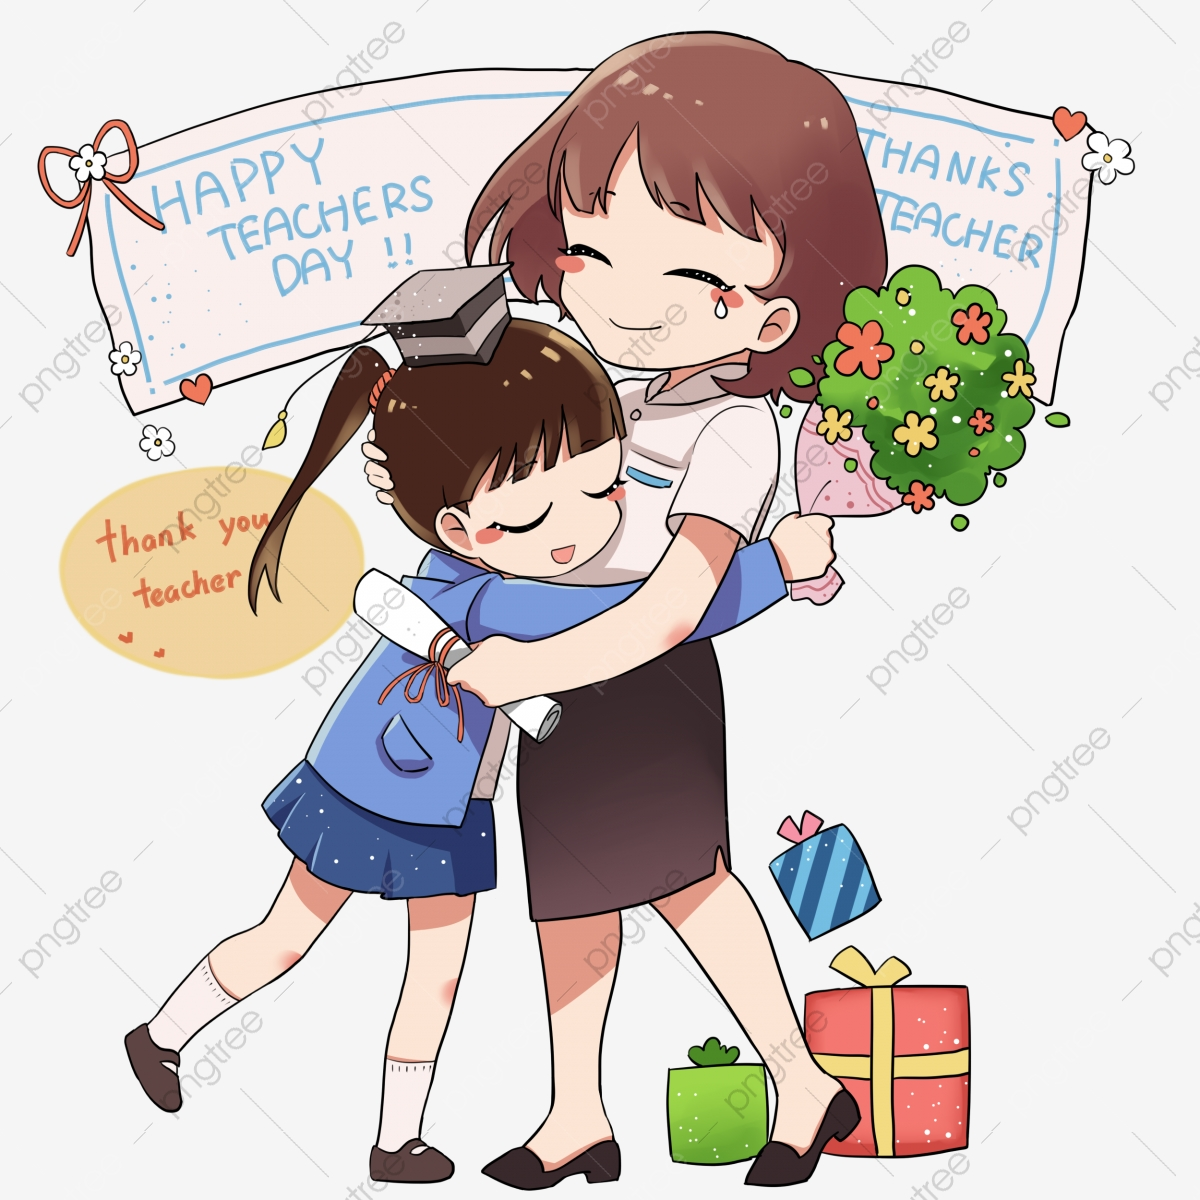 Hugging clipart work. Cartoon character hug teacher